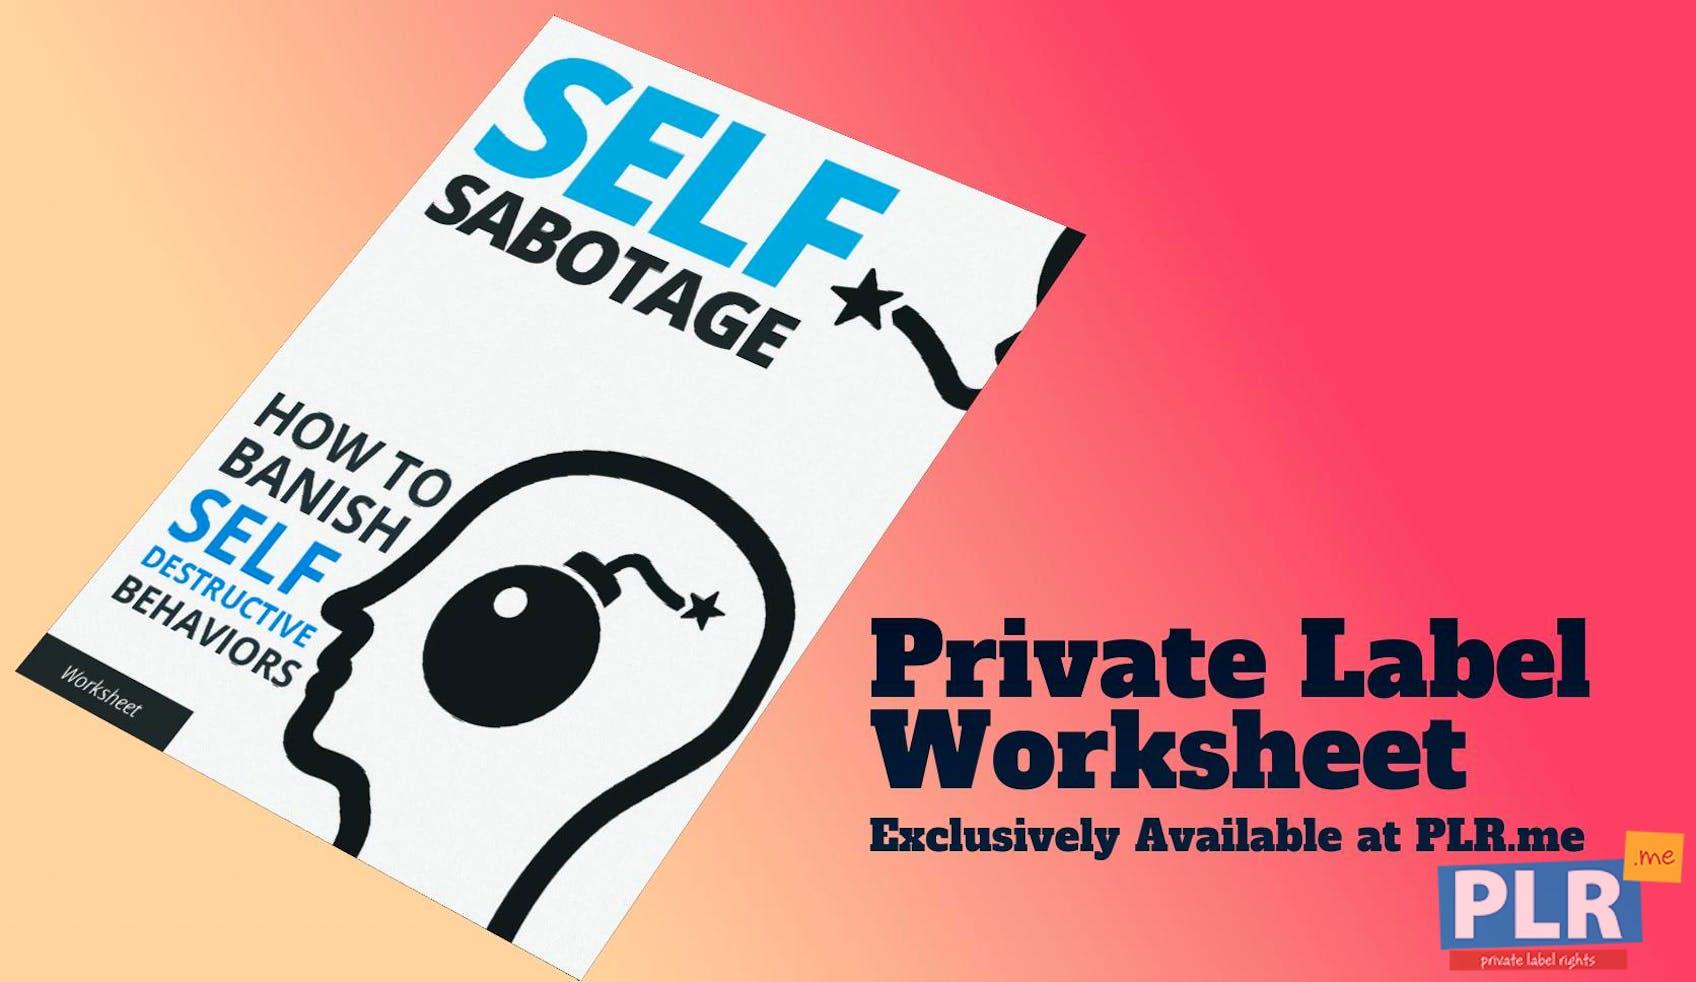 Self Sabotage How To Banish Self Destructive Behaviors Worksheet